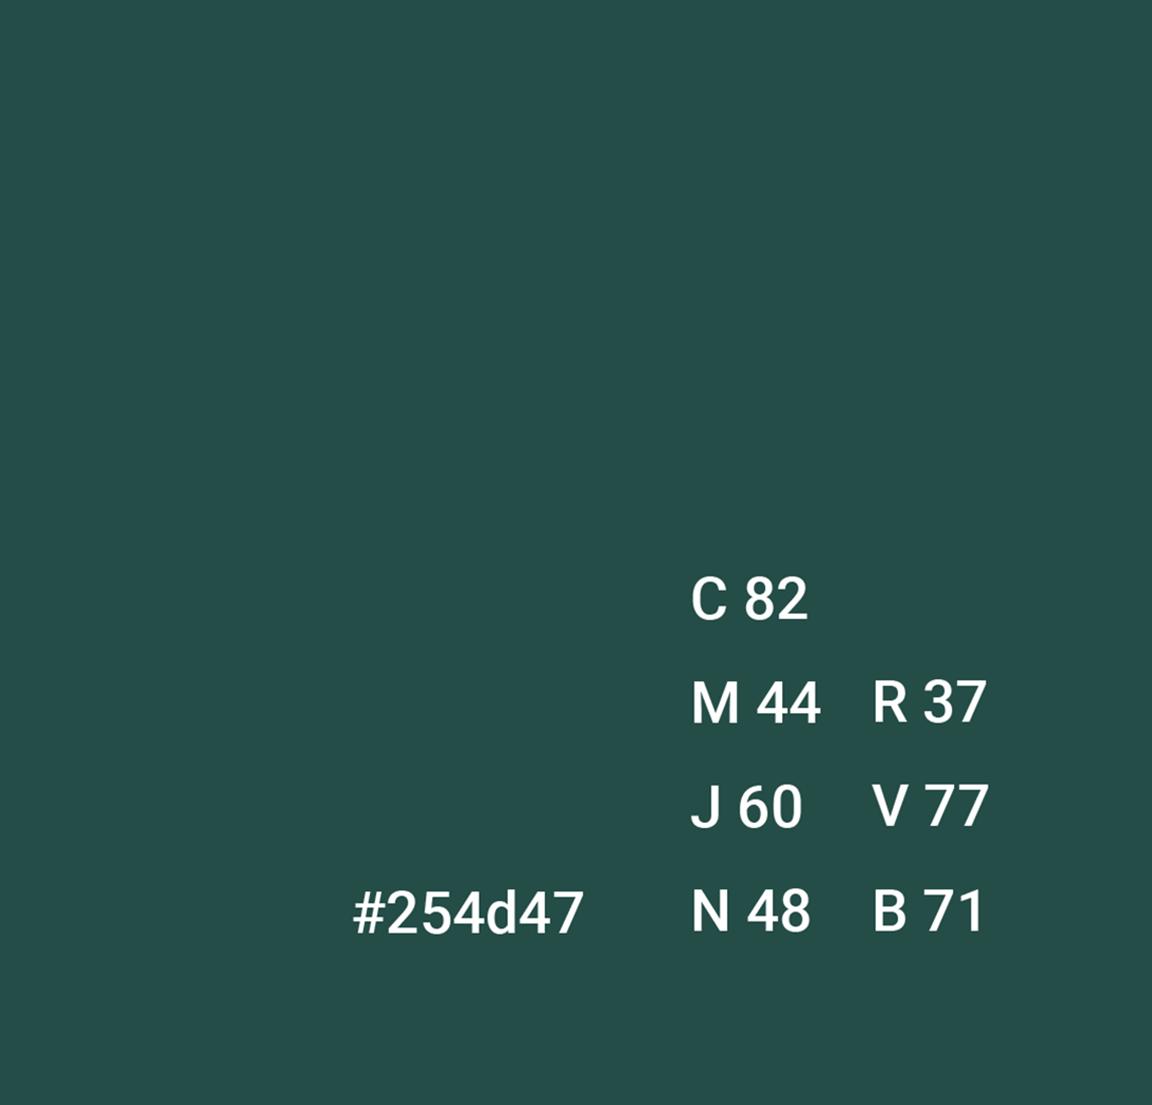 Img-longue-Ora-Couleurs-Vert01